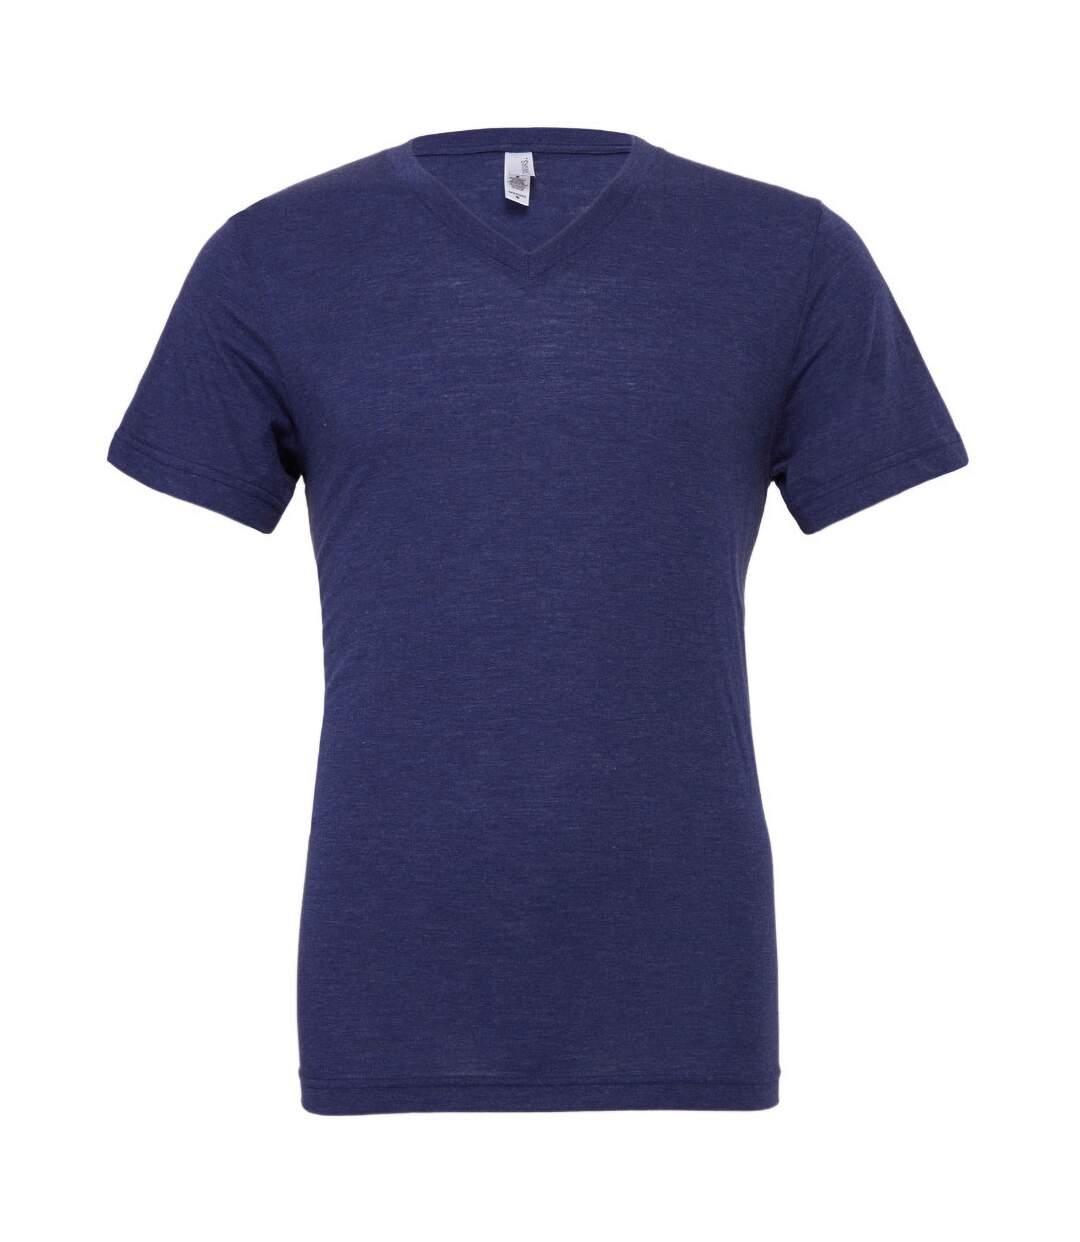 Canvas Mens Triblend V-Neck Short Sleeve T-Shirt (Navy Triblend) - UTBC1333